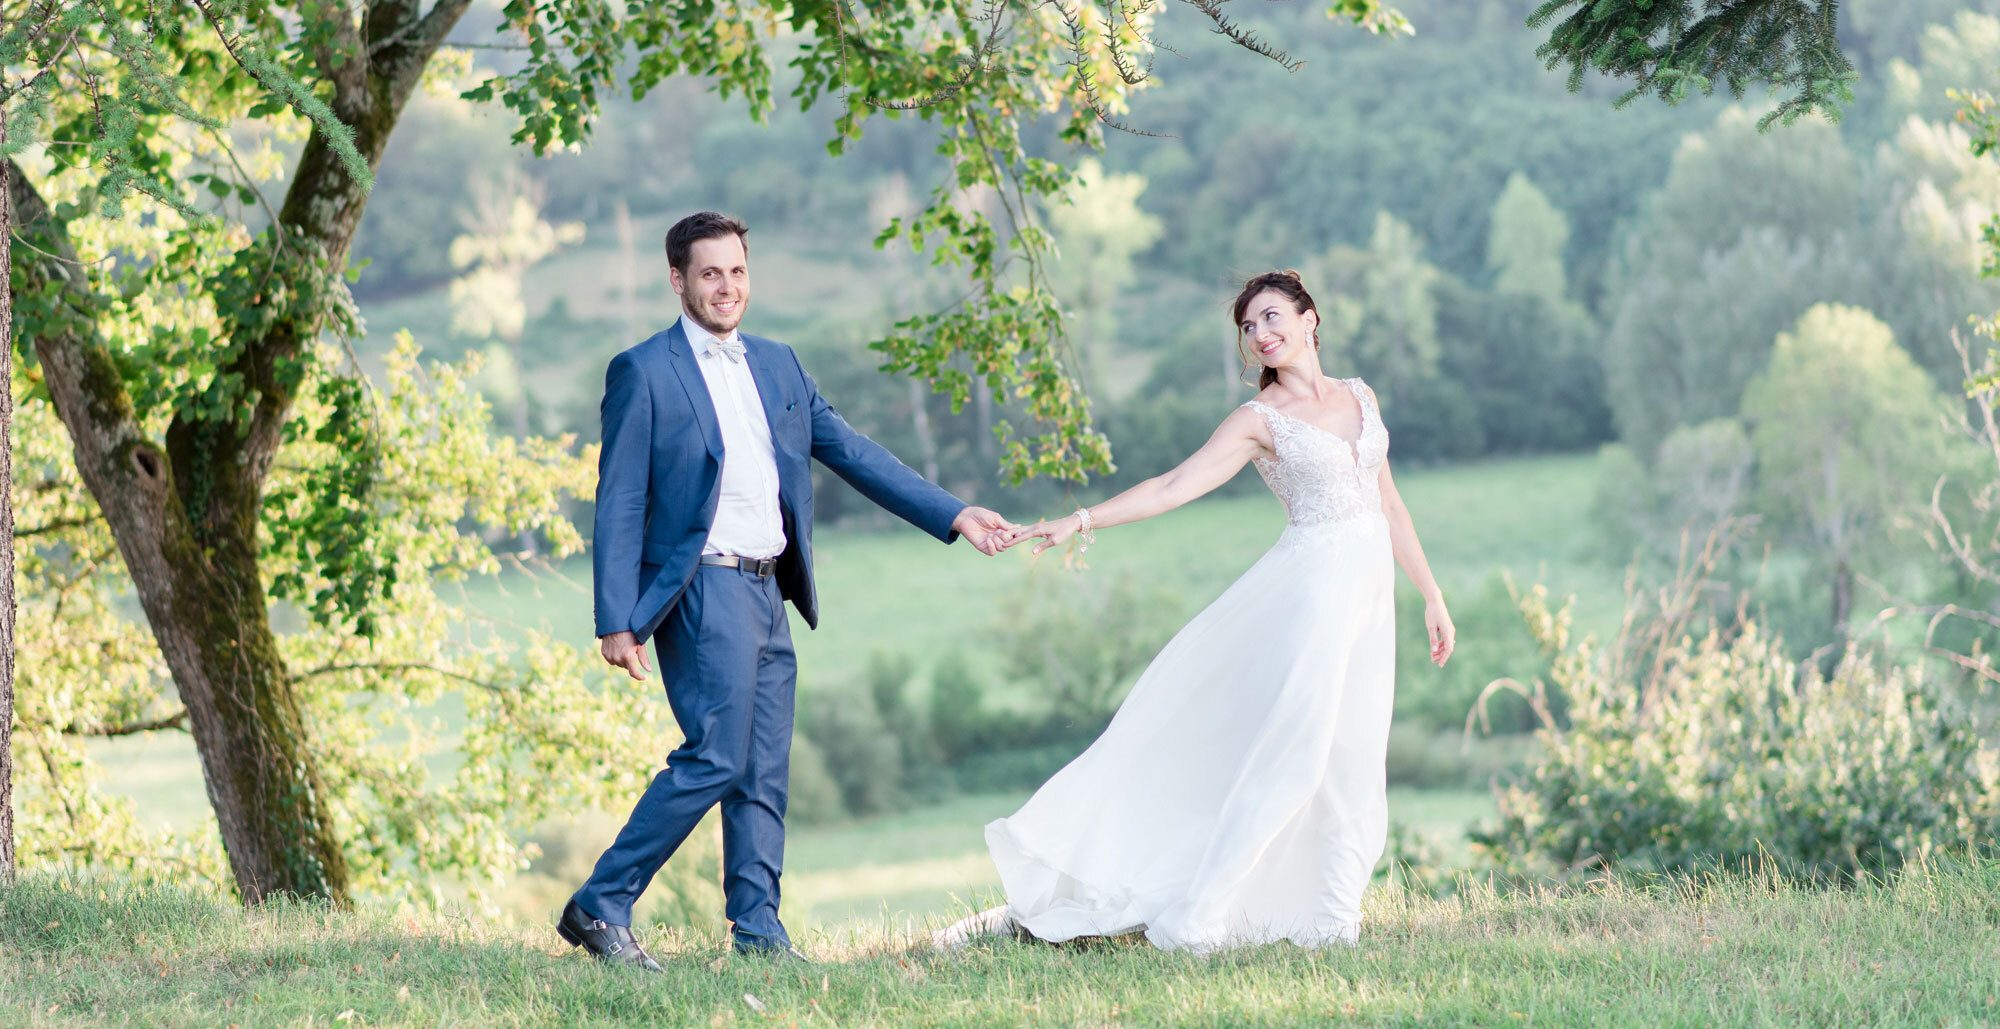 clemence aresu photographe mariage